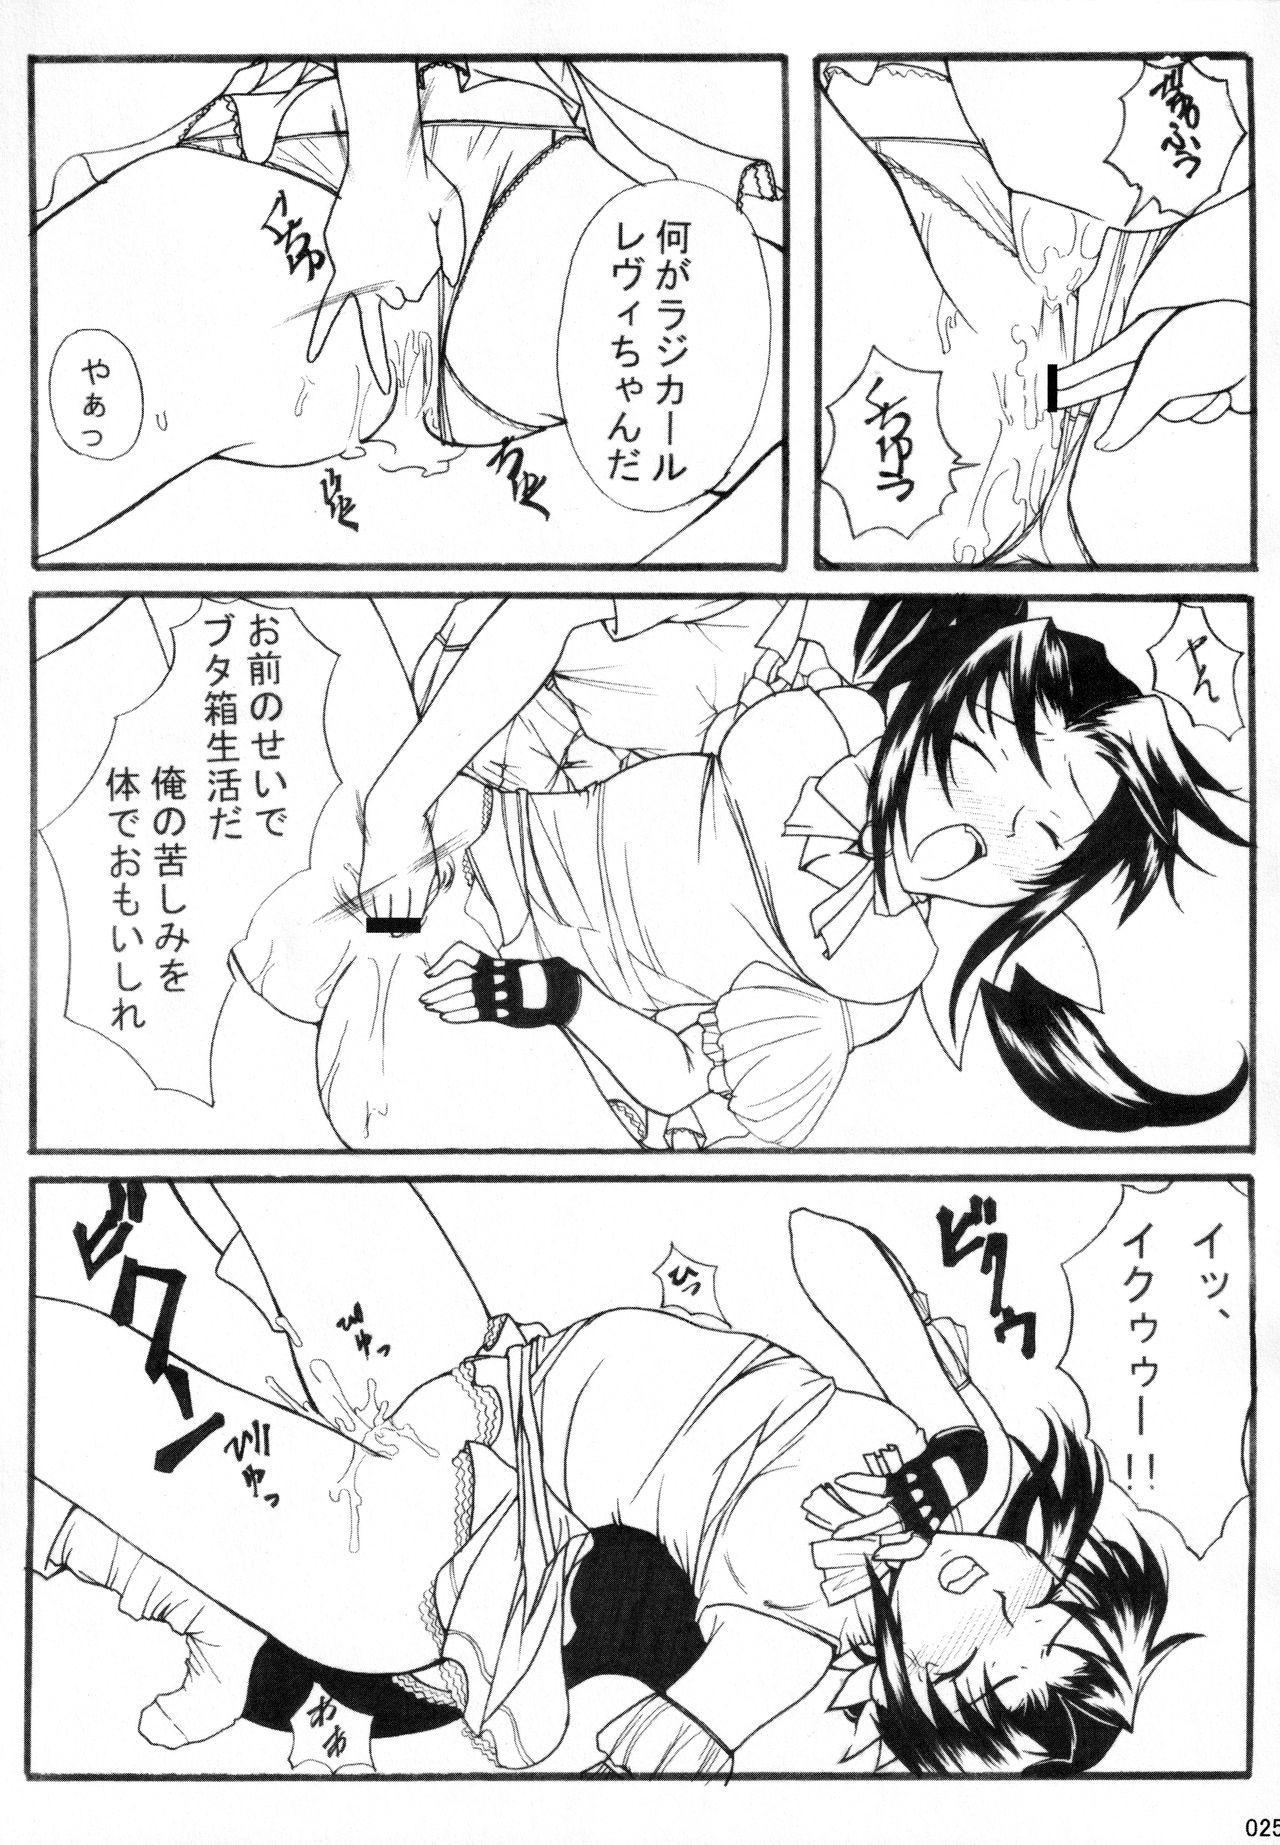 Otona no Kandume Vol.001 23